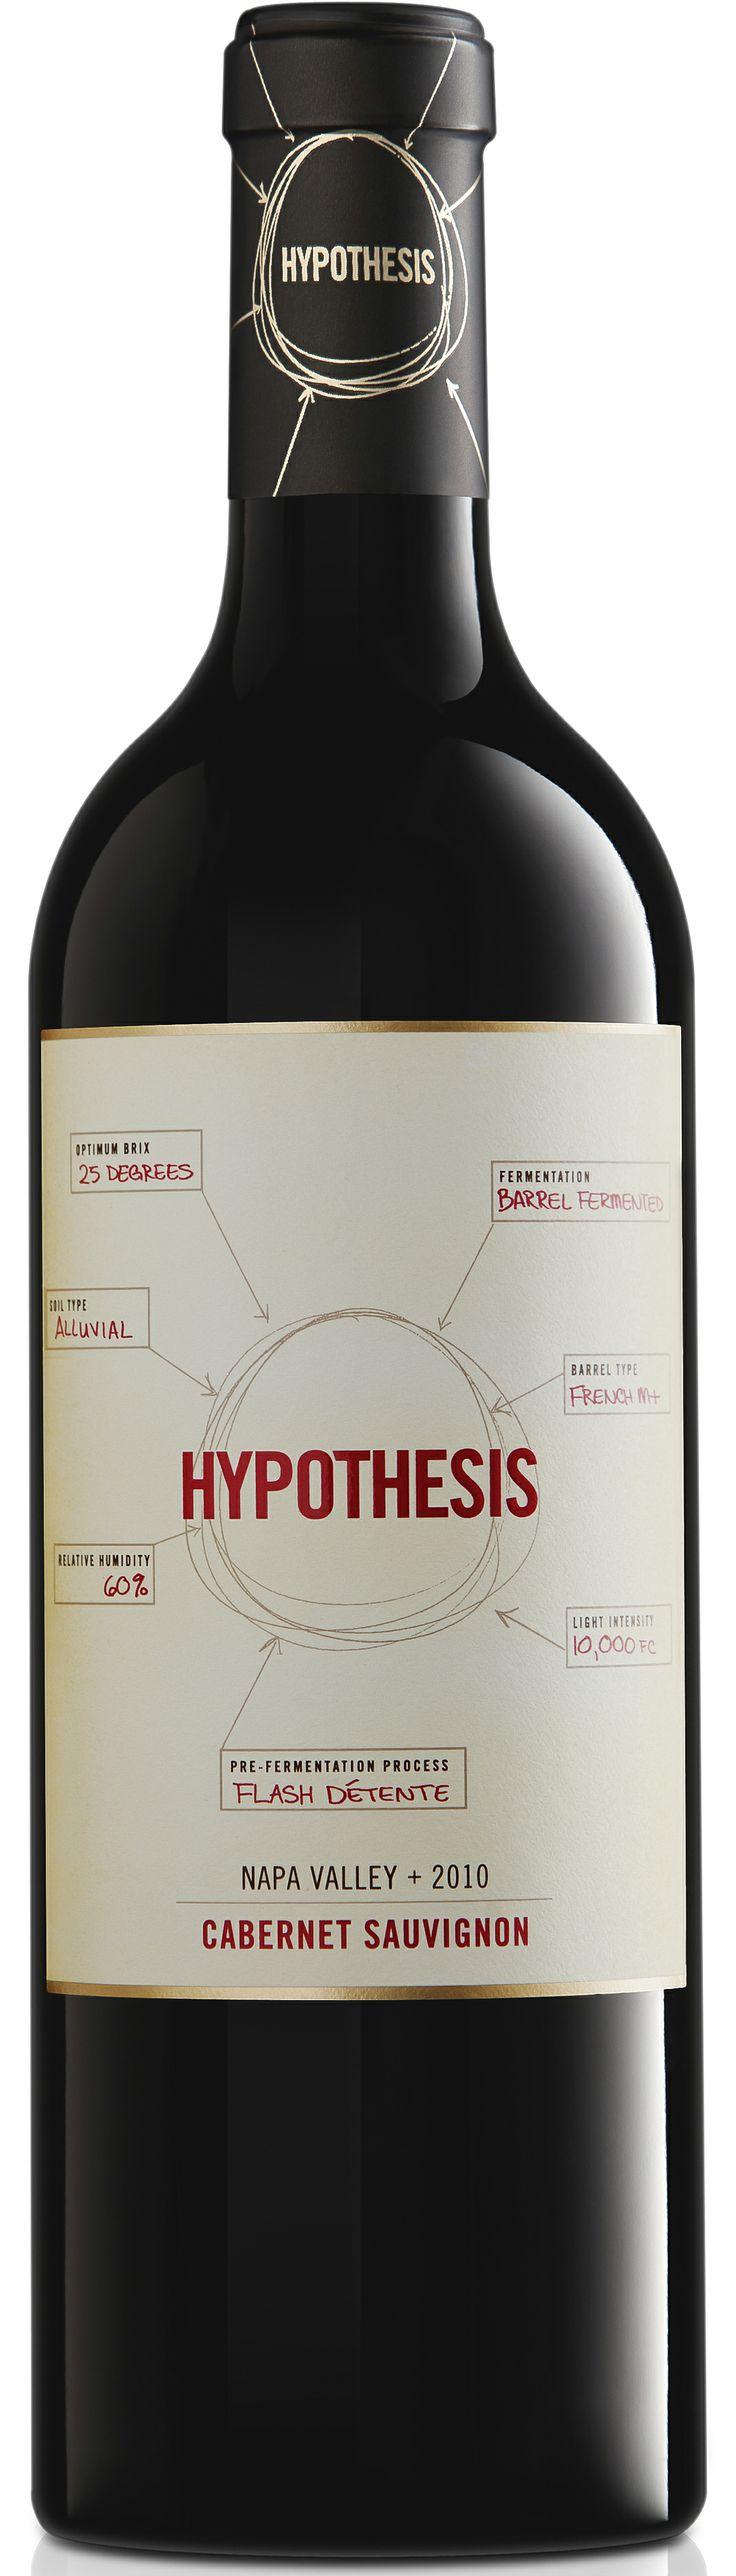 complex hypothesis definition